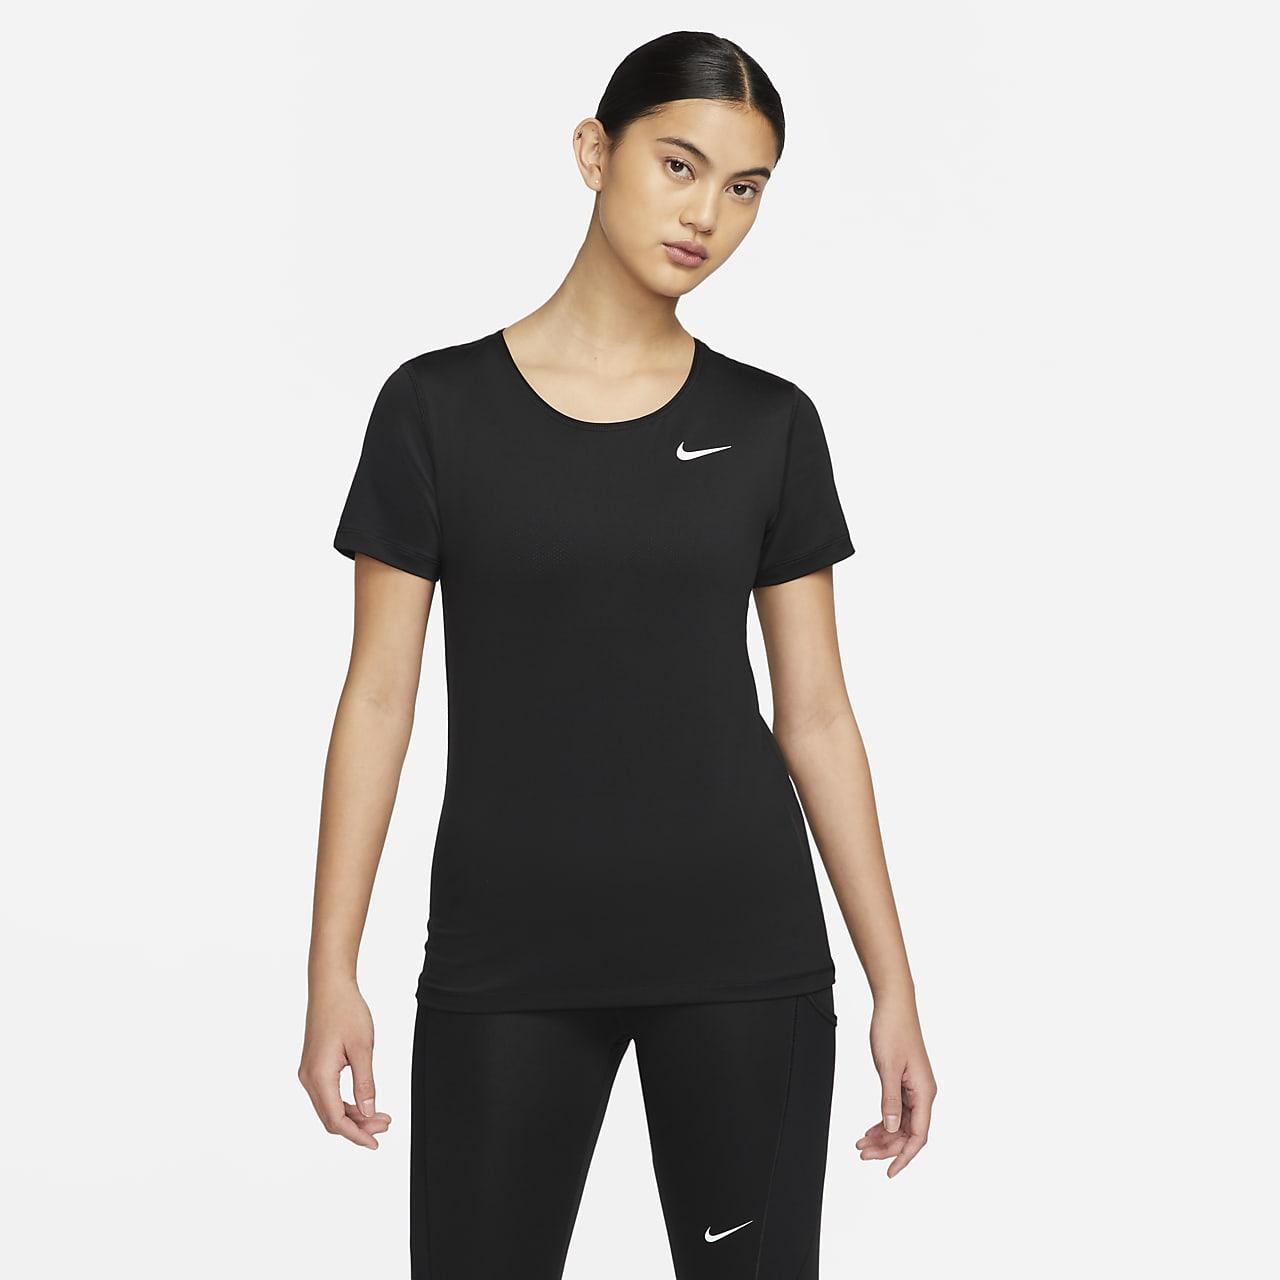 c99ddc46bba269 Nike Pro Women s Short-Sleeve Training Top. Nike.com GB